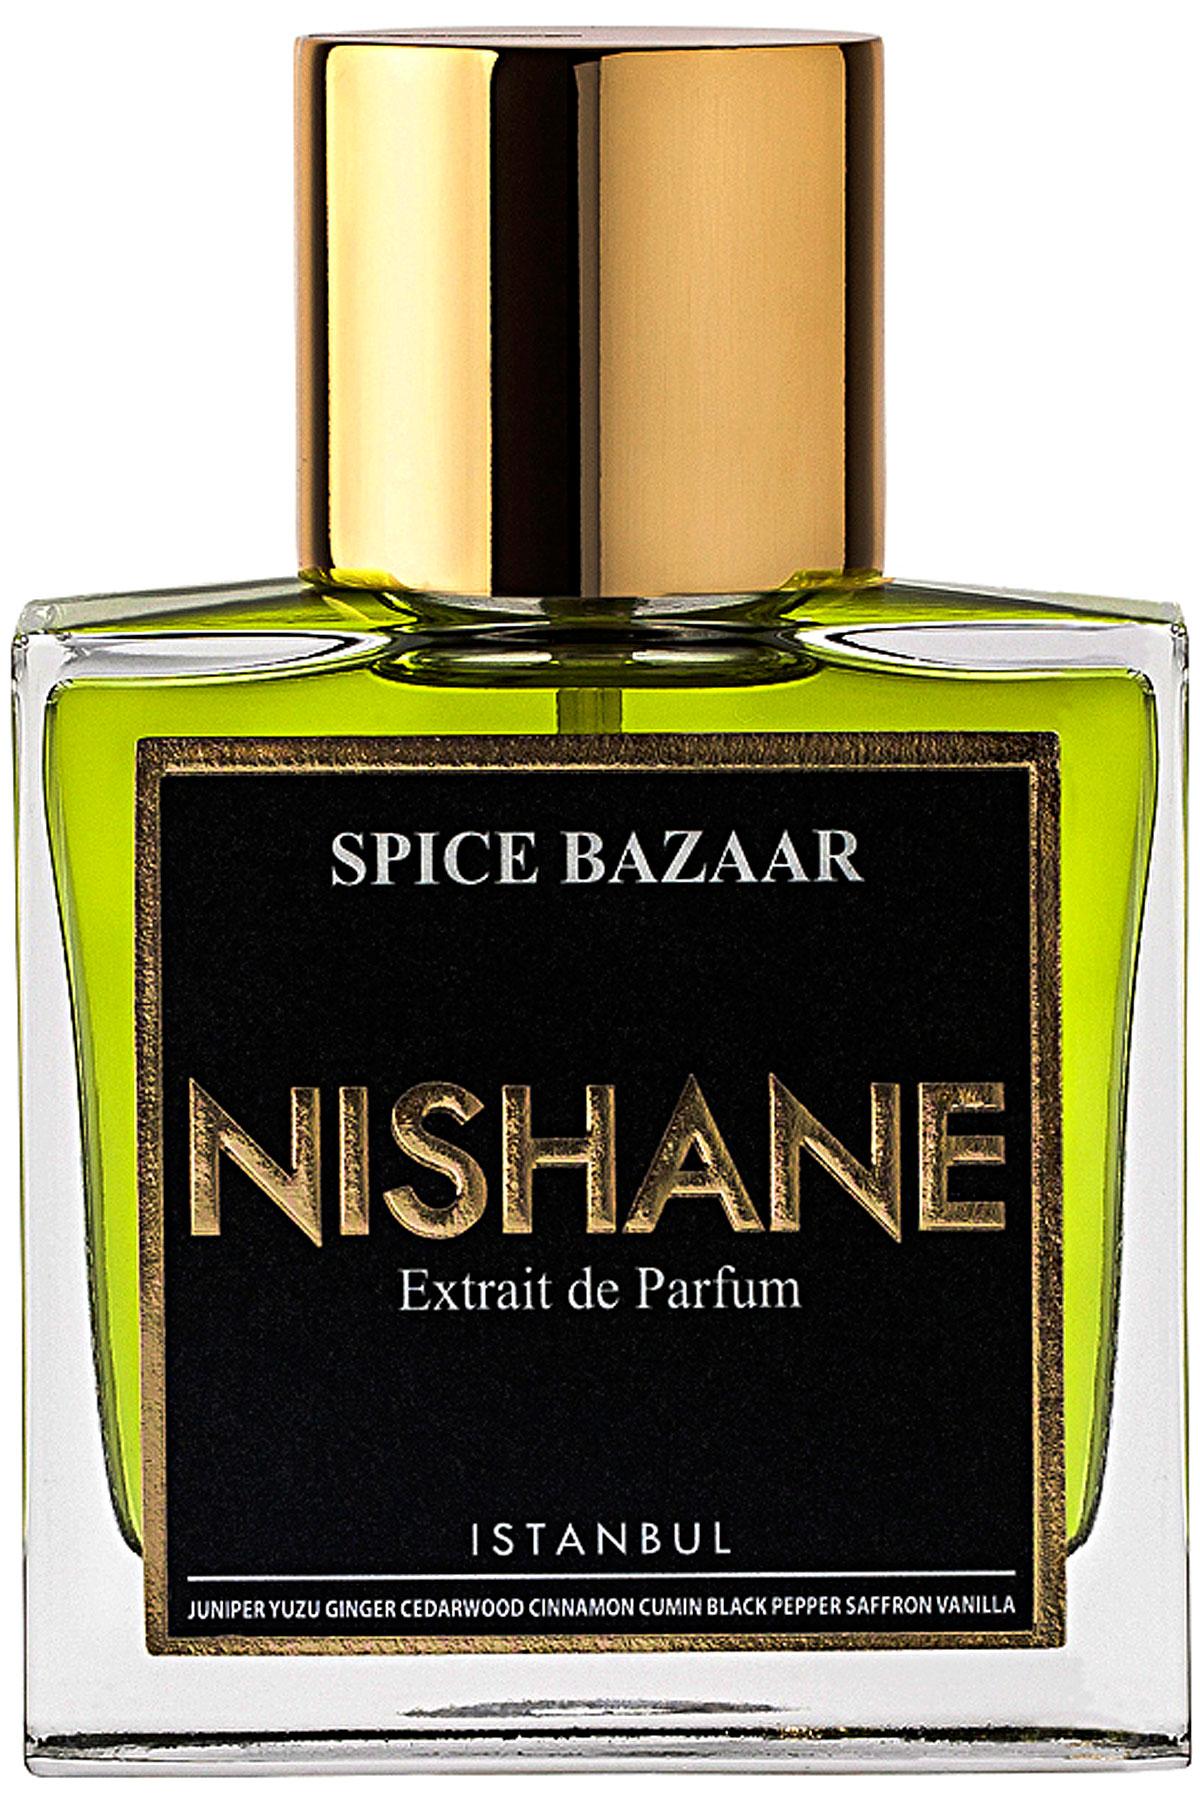 Nishane Fragrances for Men, Spice Bazaar - Extrait De Parfum - 50 Ml, 2019, 50 ml